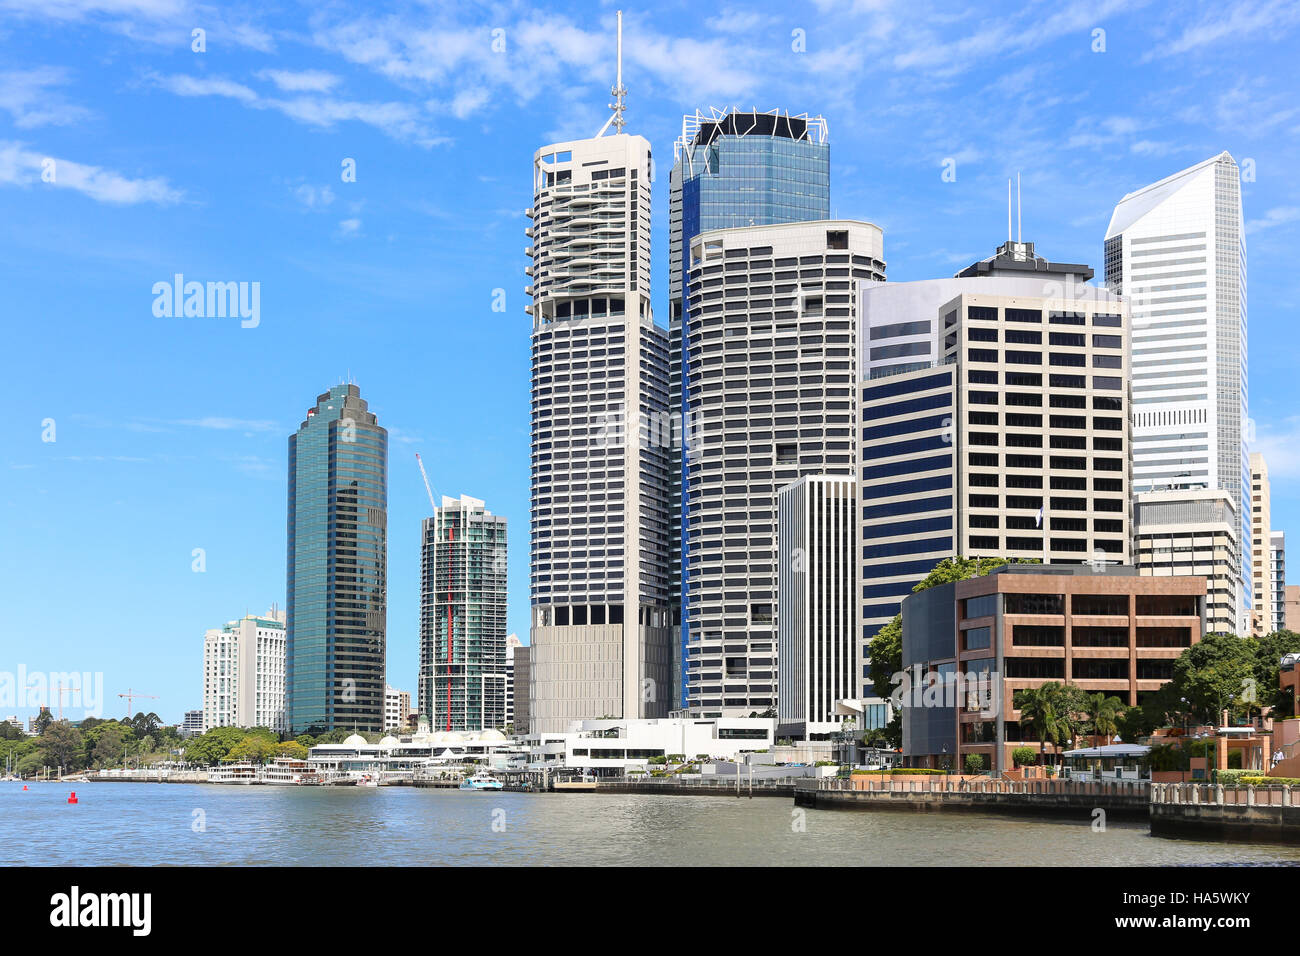 Brisbane city CBD skyline with skyscrapers next to the river promenade - Stock Image